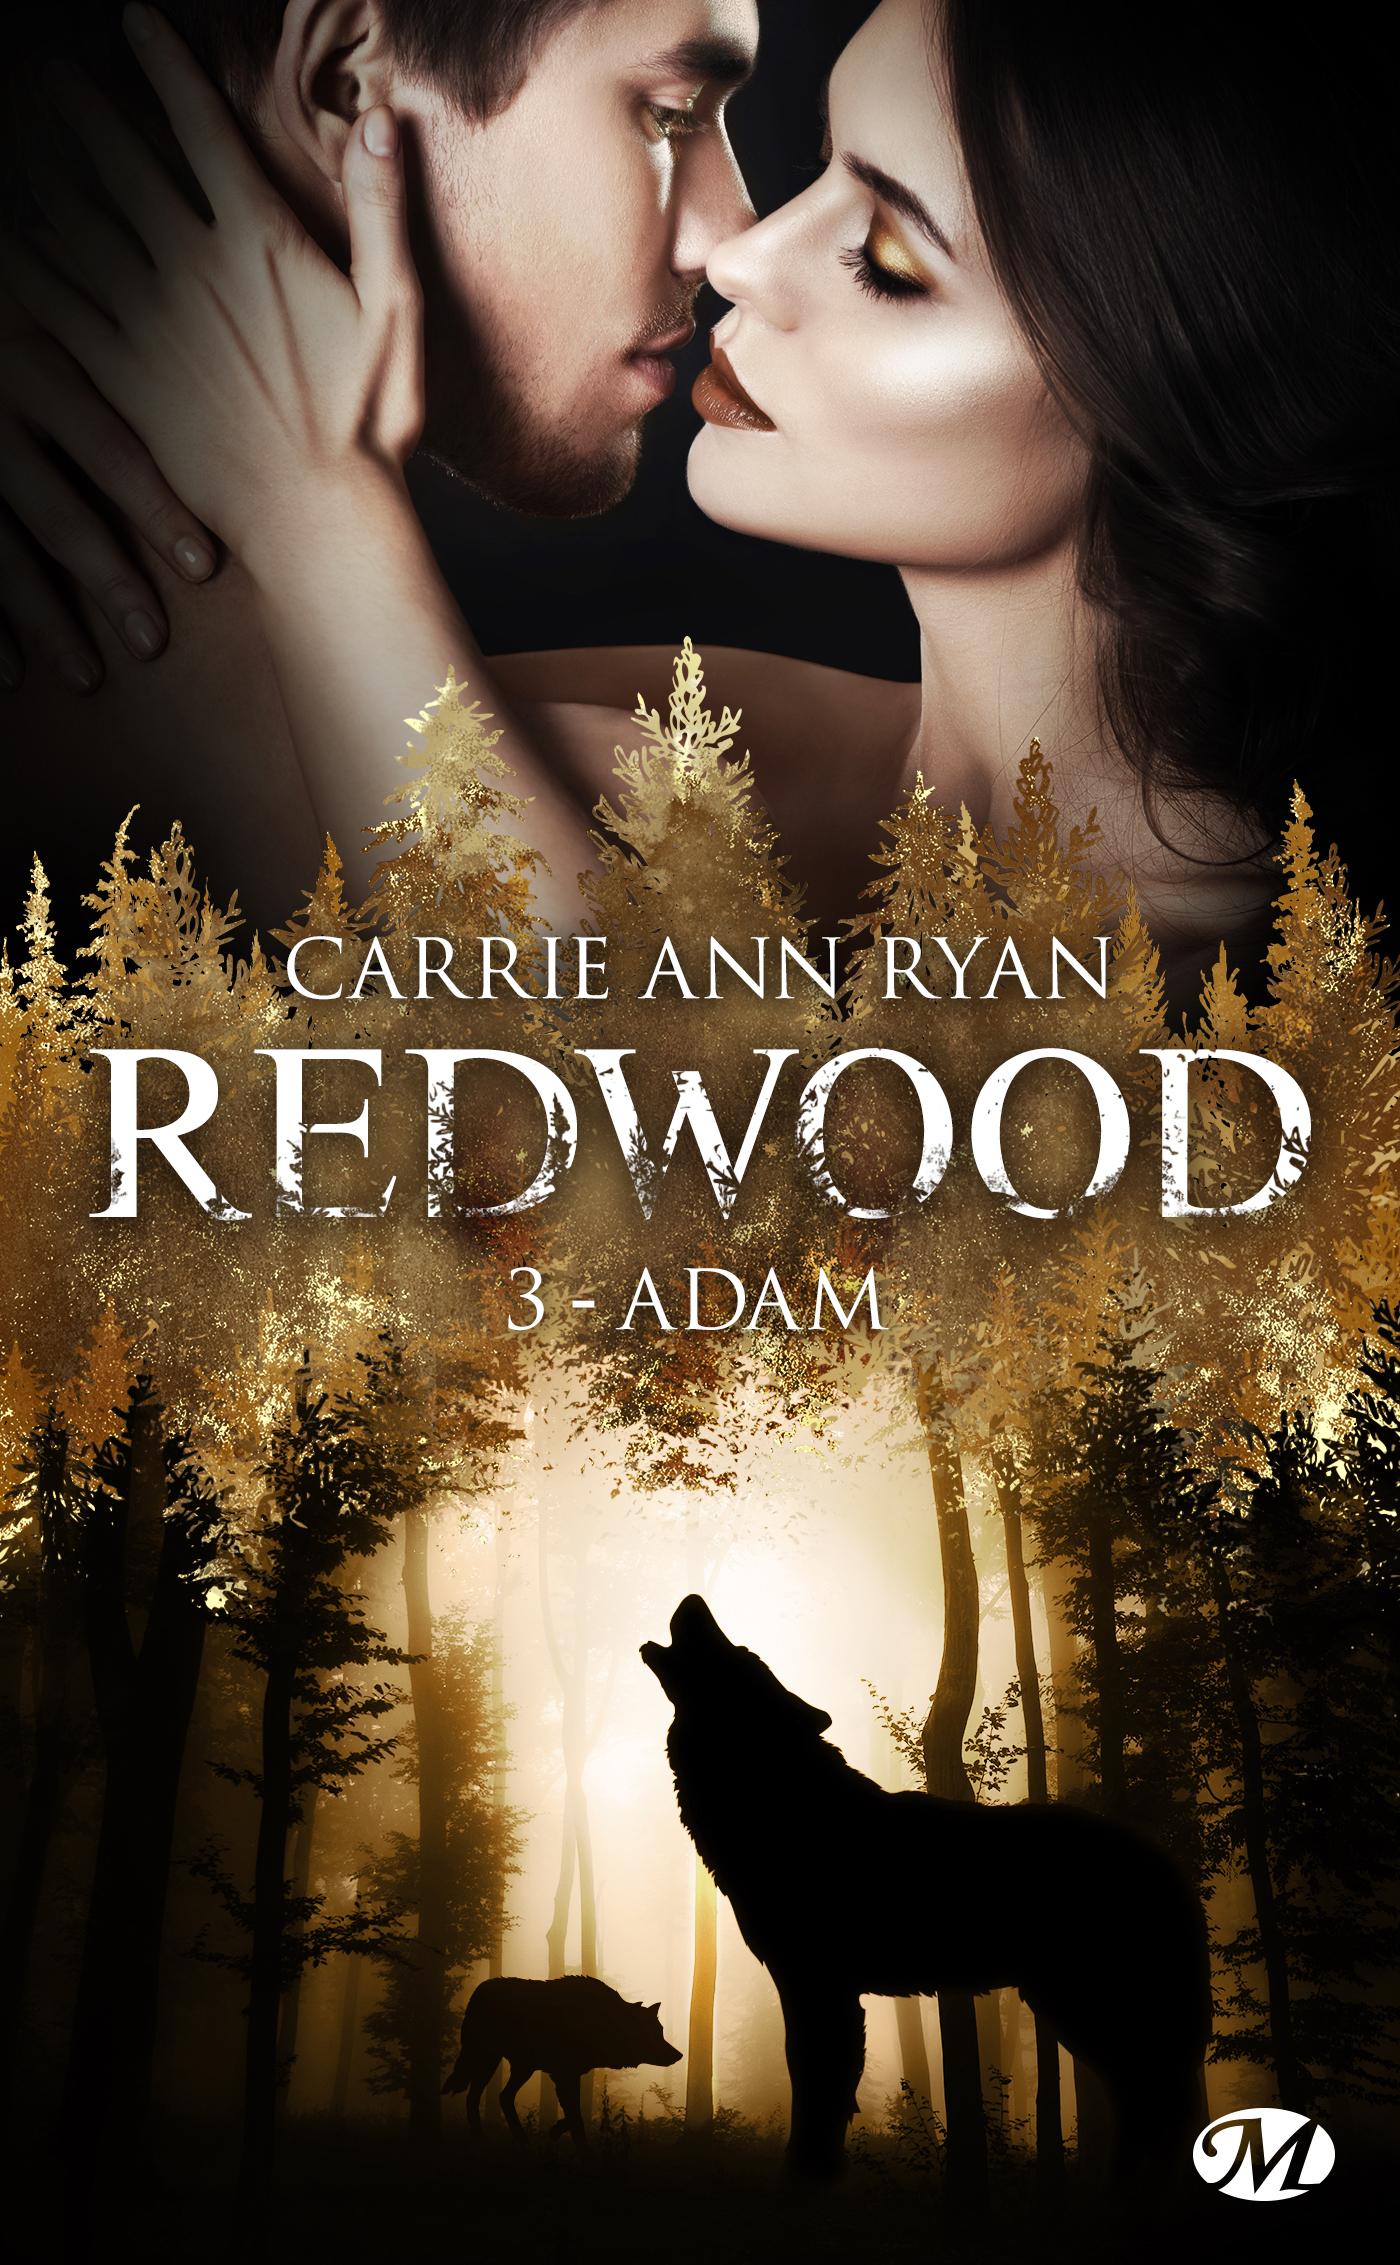 cdn1.booknode.com/book_cover/1193/full/redwood-tome-3-adam-1192905.jpg